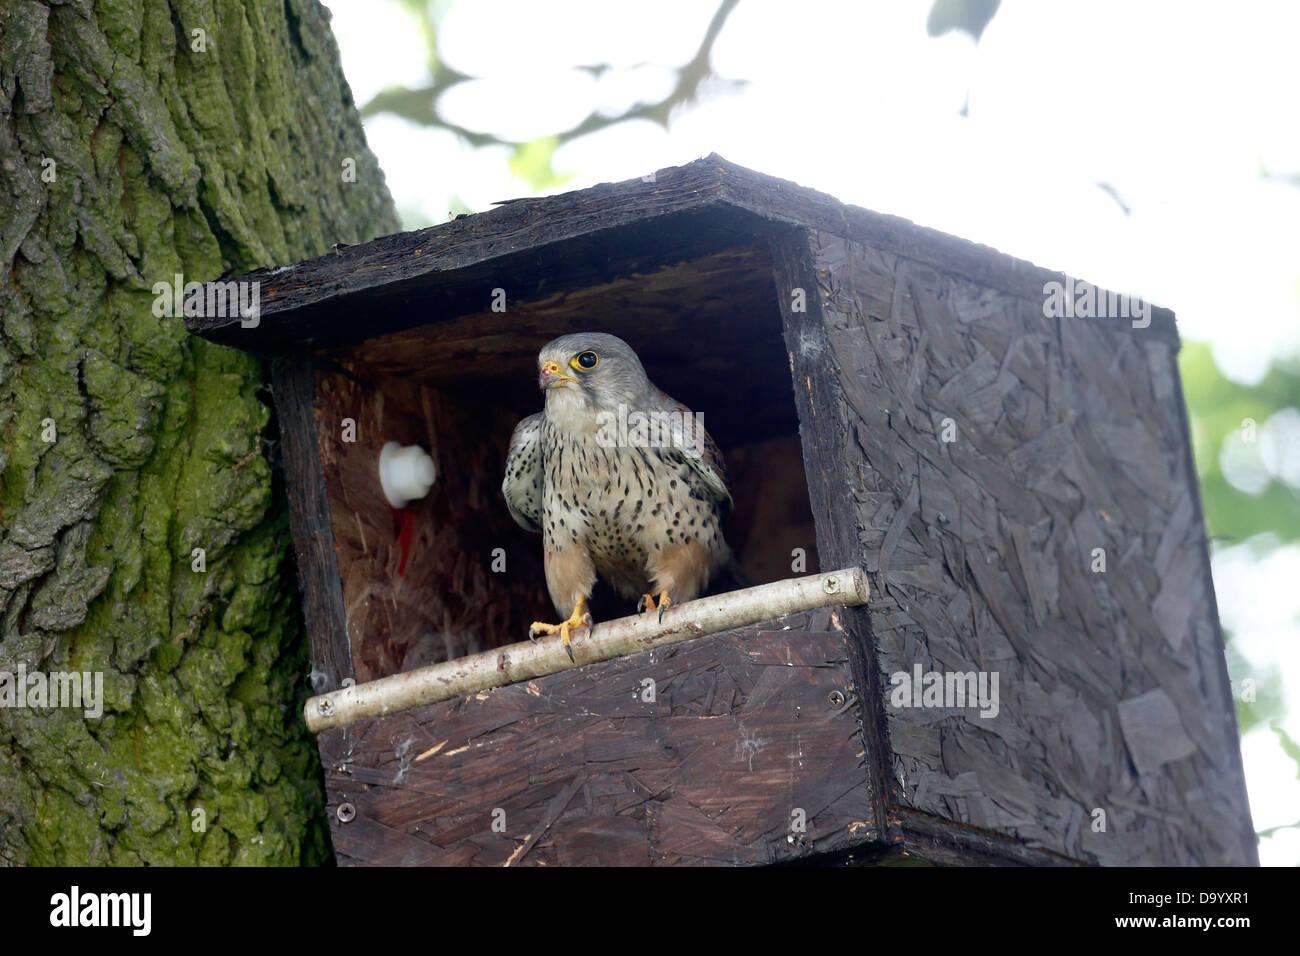 Kestrel, Falco tinnunculus, single male at nest box, Warwickshire, June 2013 - Stock Image